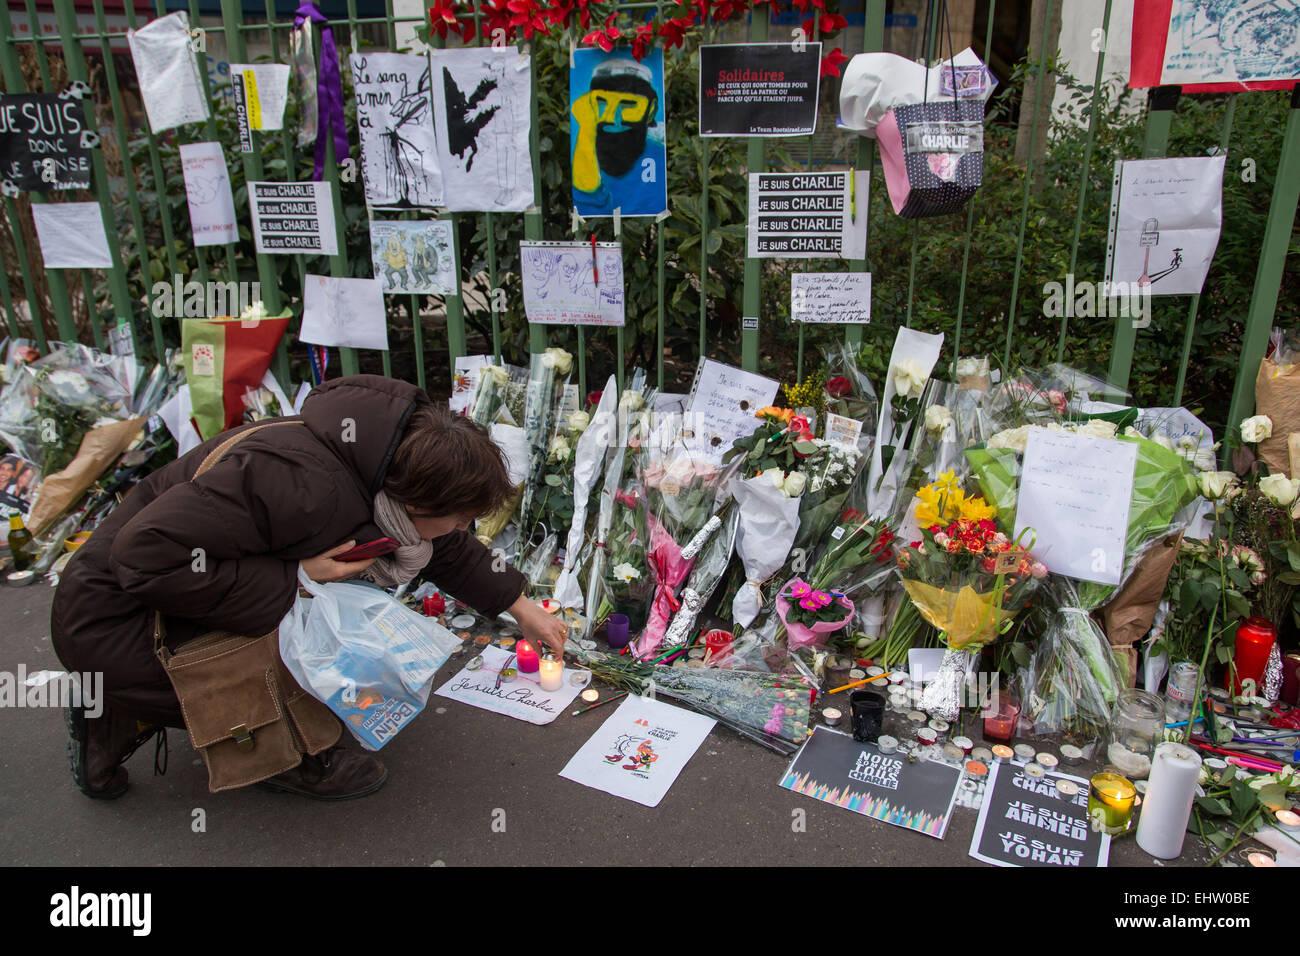 PARADE AGAINST TERRORISM, REPUBLICAN MARCH - Stock Image